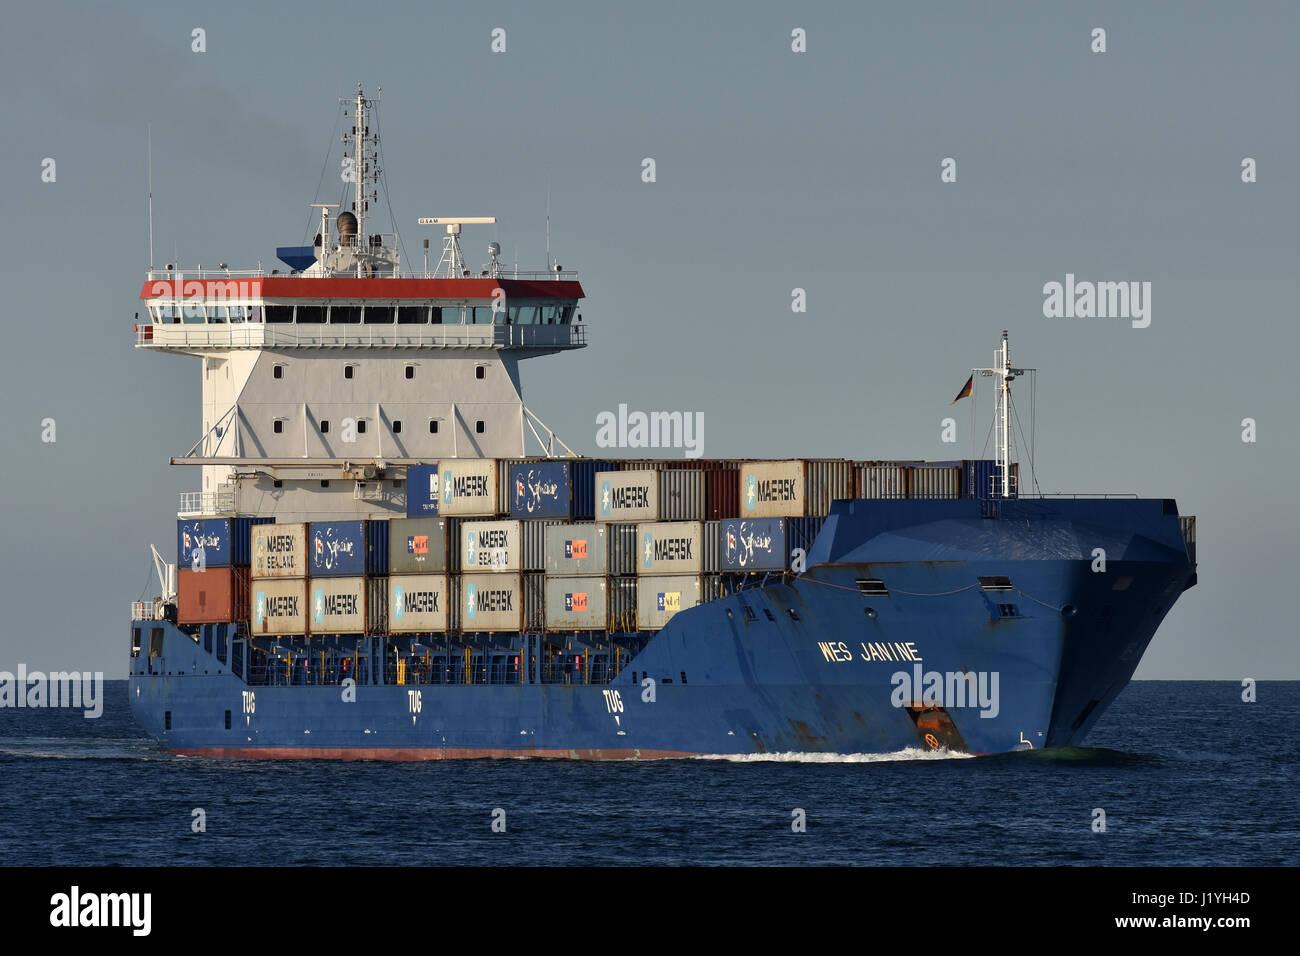 Feedervessel WES Janine inbound for Kiel Canal - Stock Image